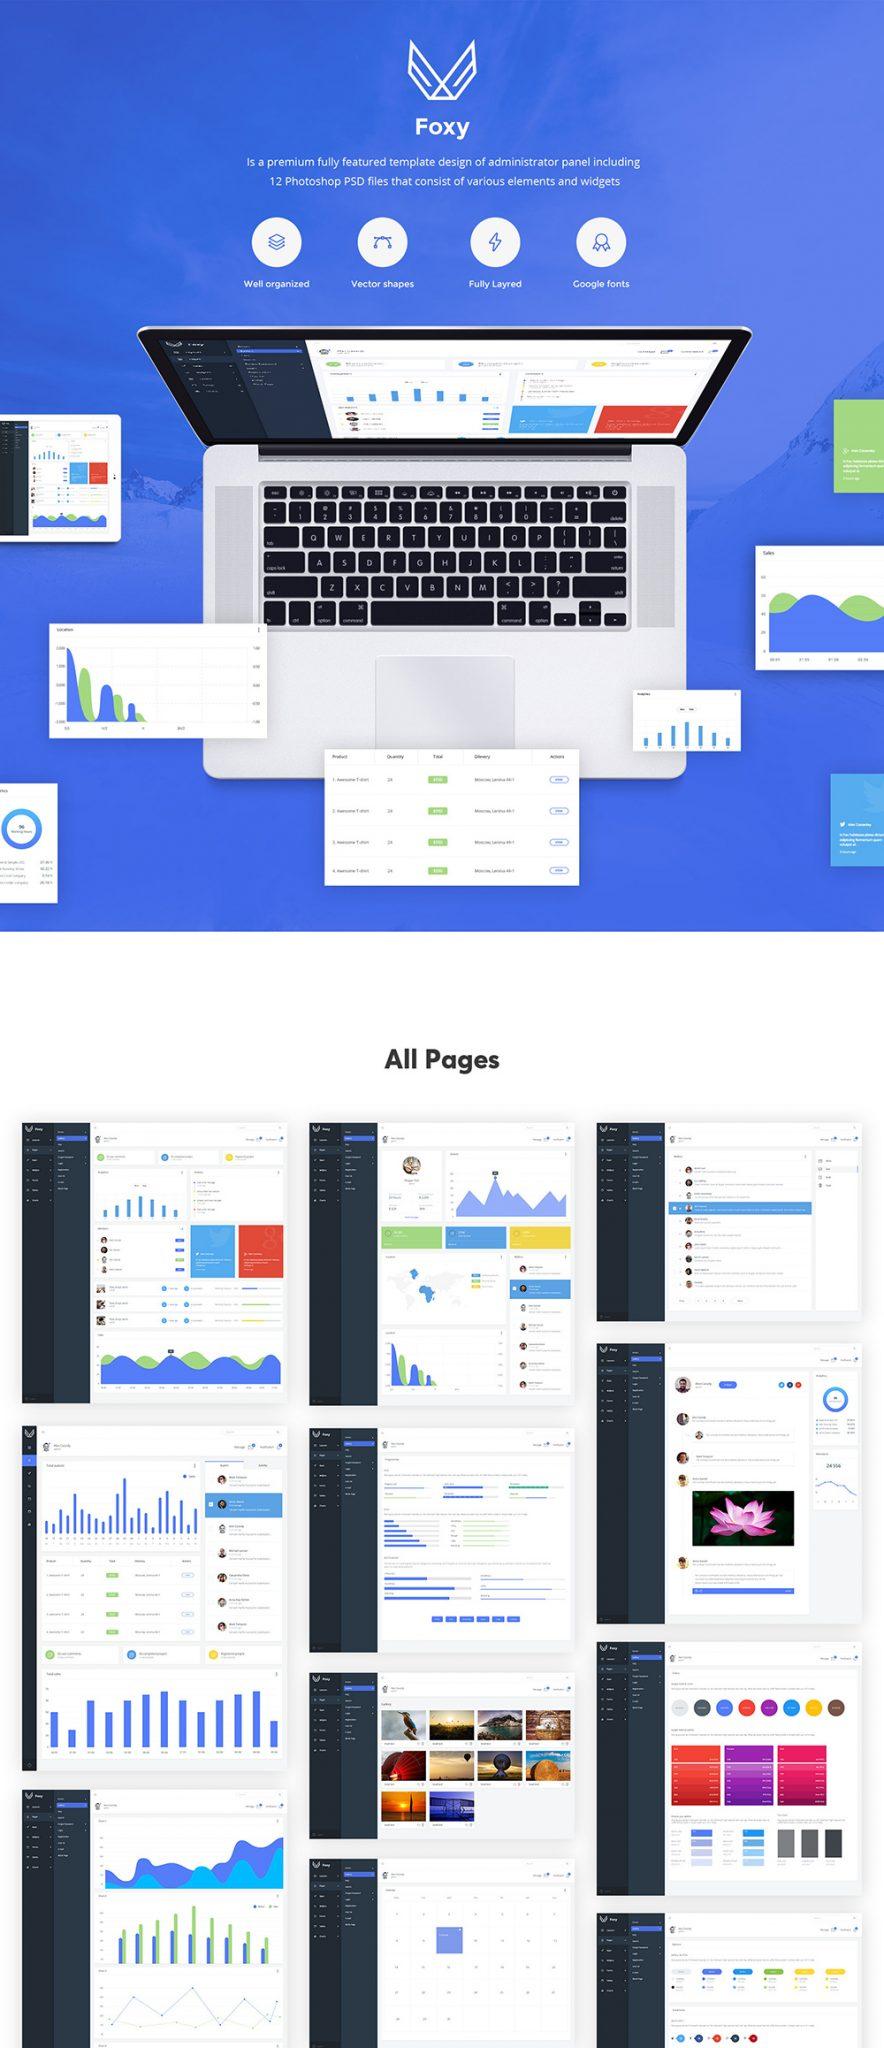 Foxy Admin UI Dashboard - Ui Kit for Photoshop